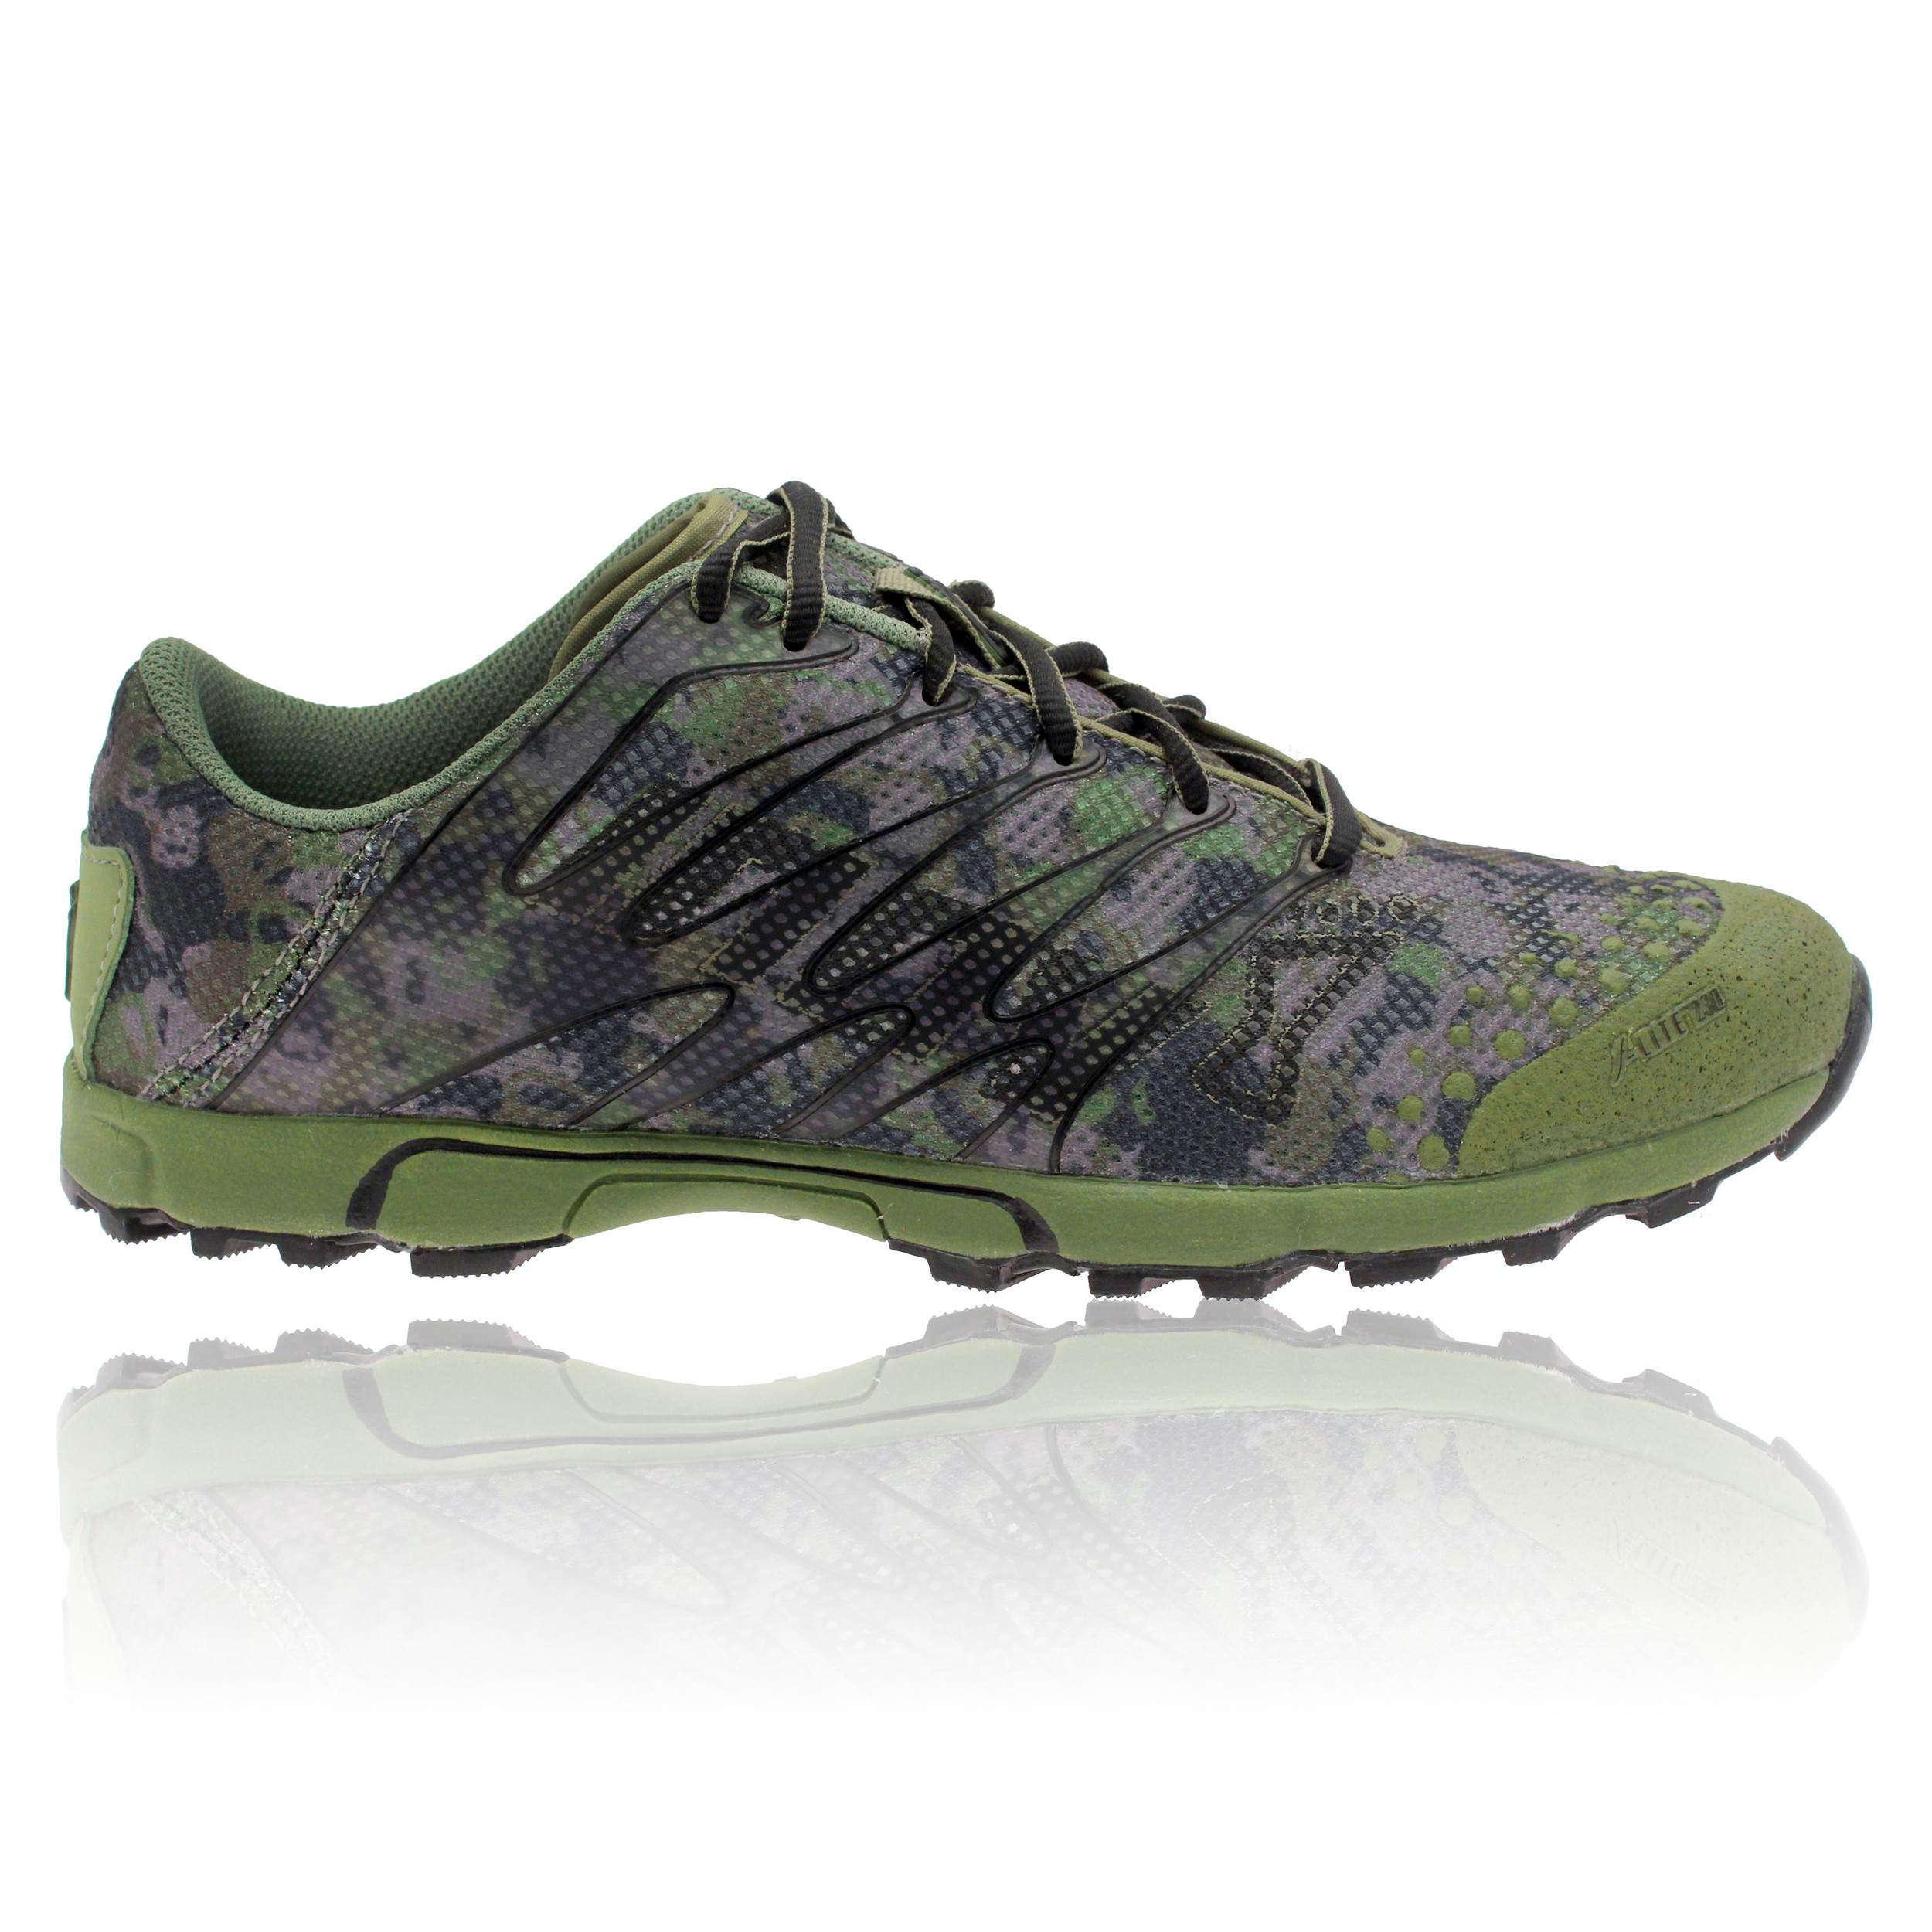 Trufit Shoes Uk